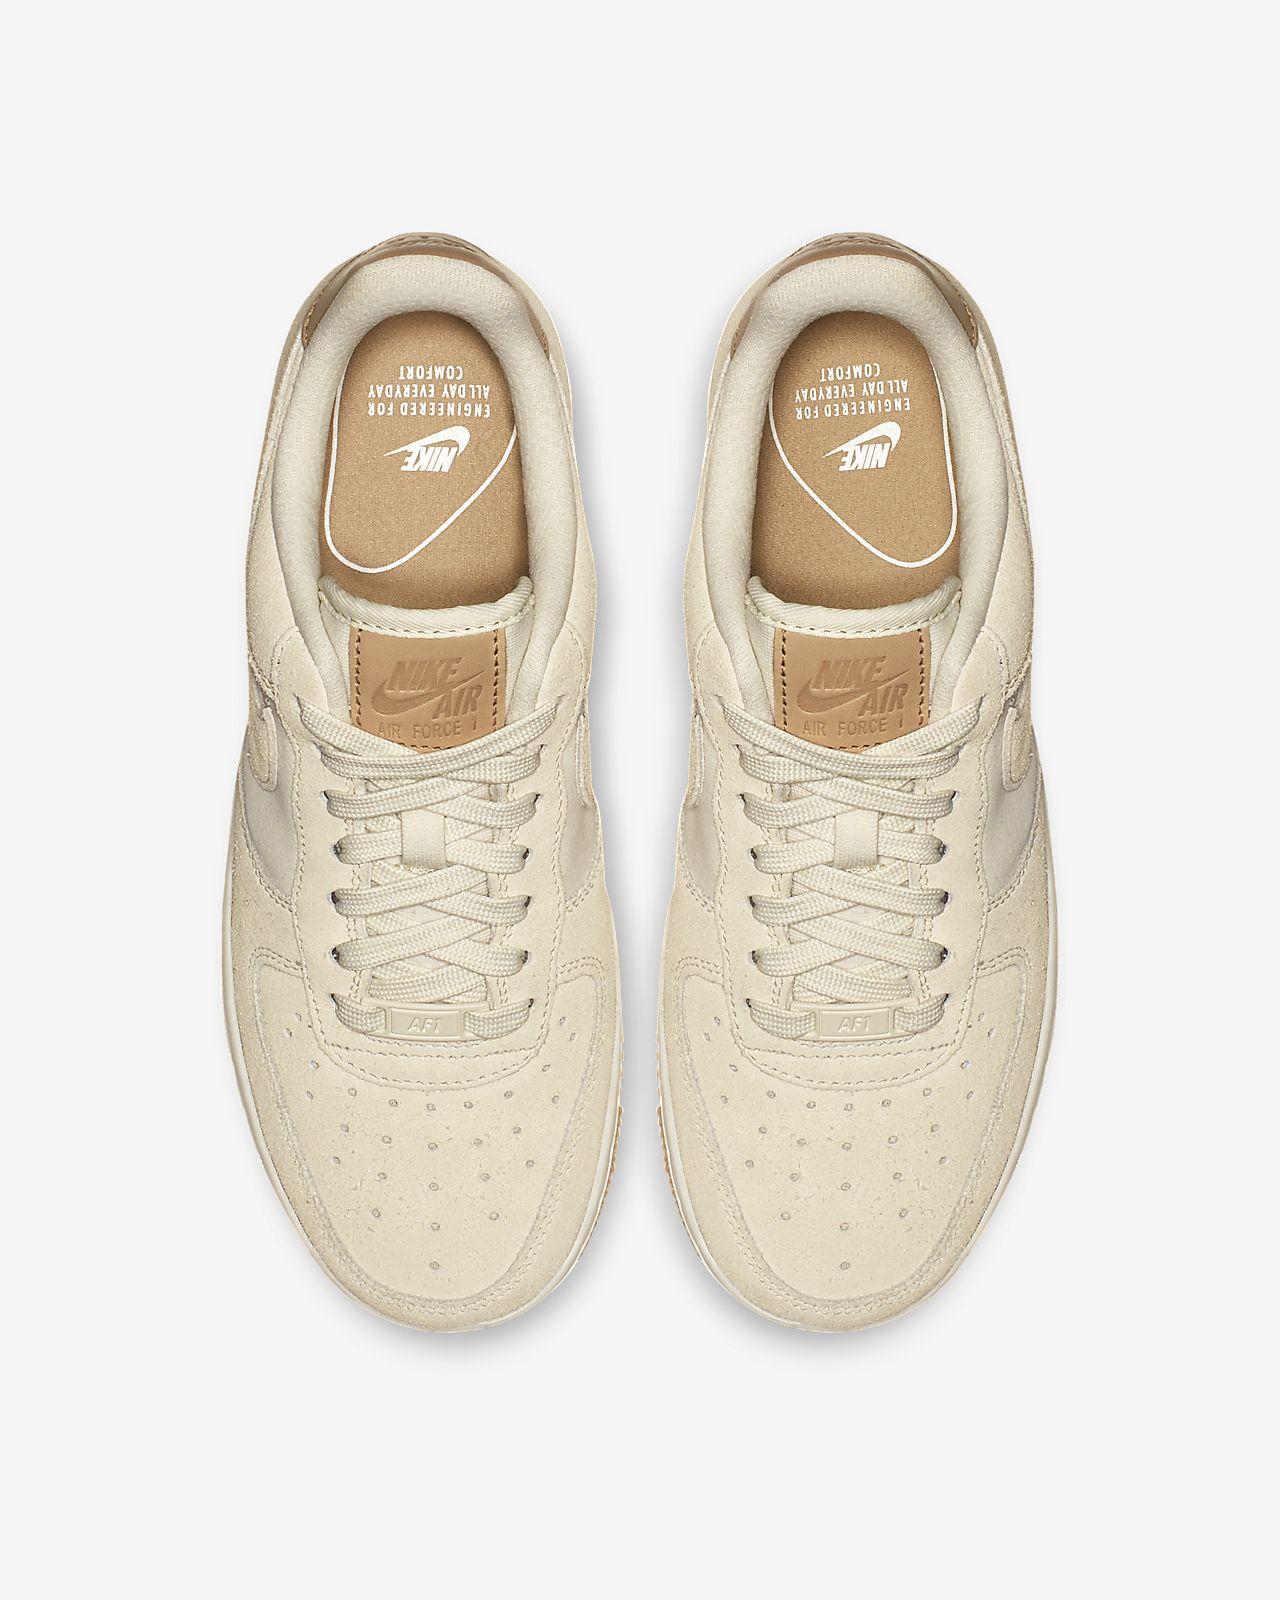 best service 1a20a a8237 ... Nike Air Force 1  07 Low Premium Women s Shoe